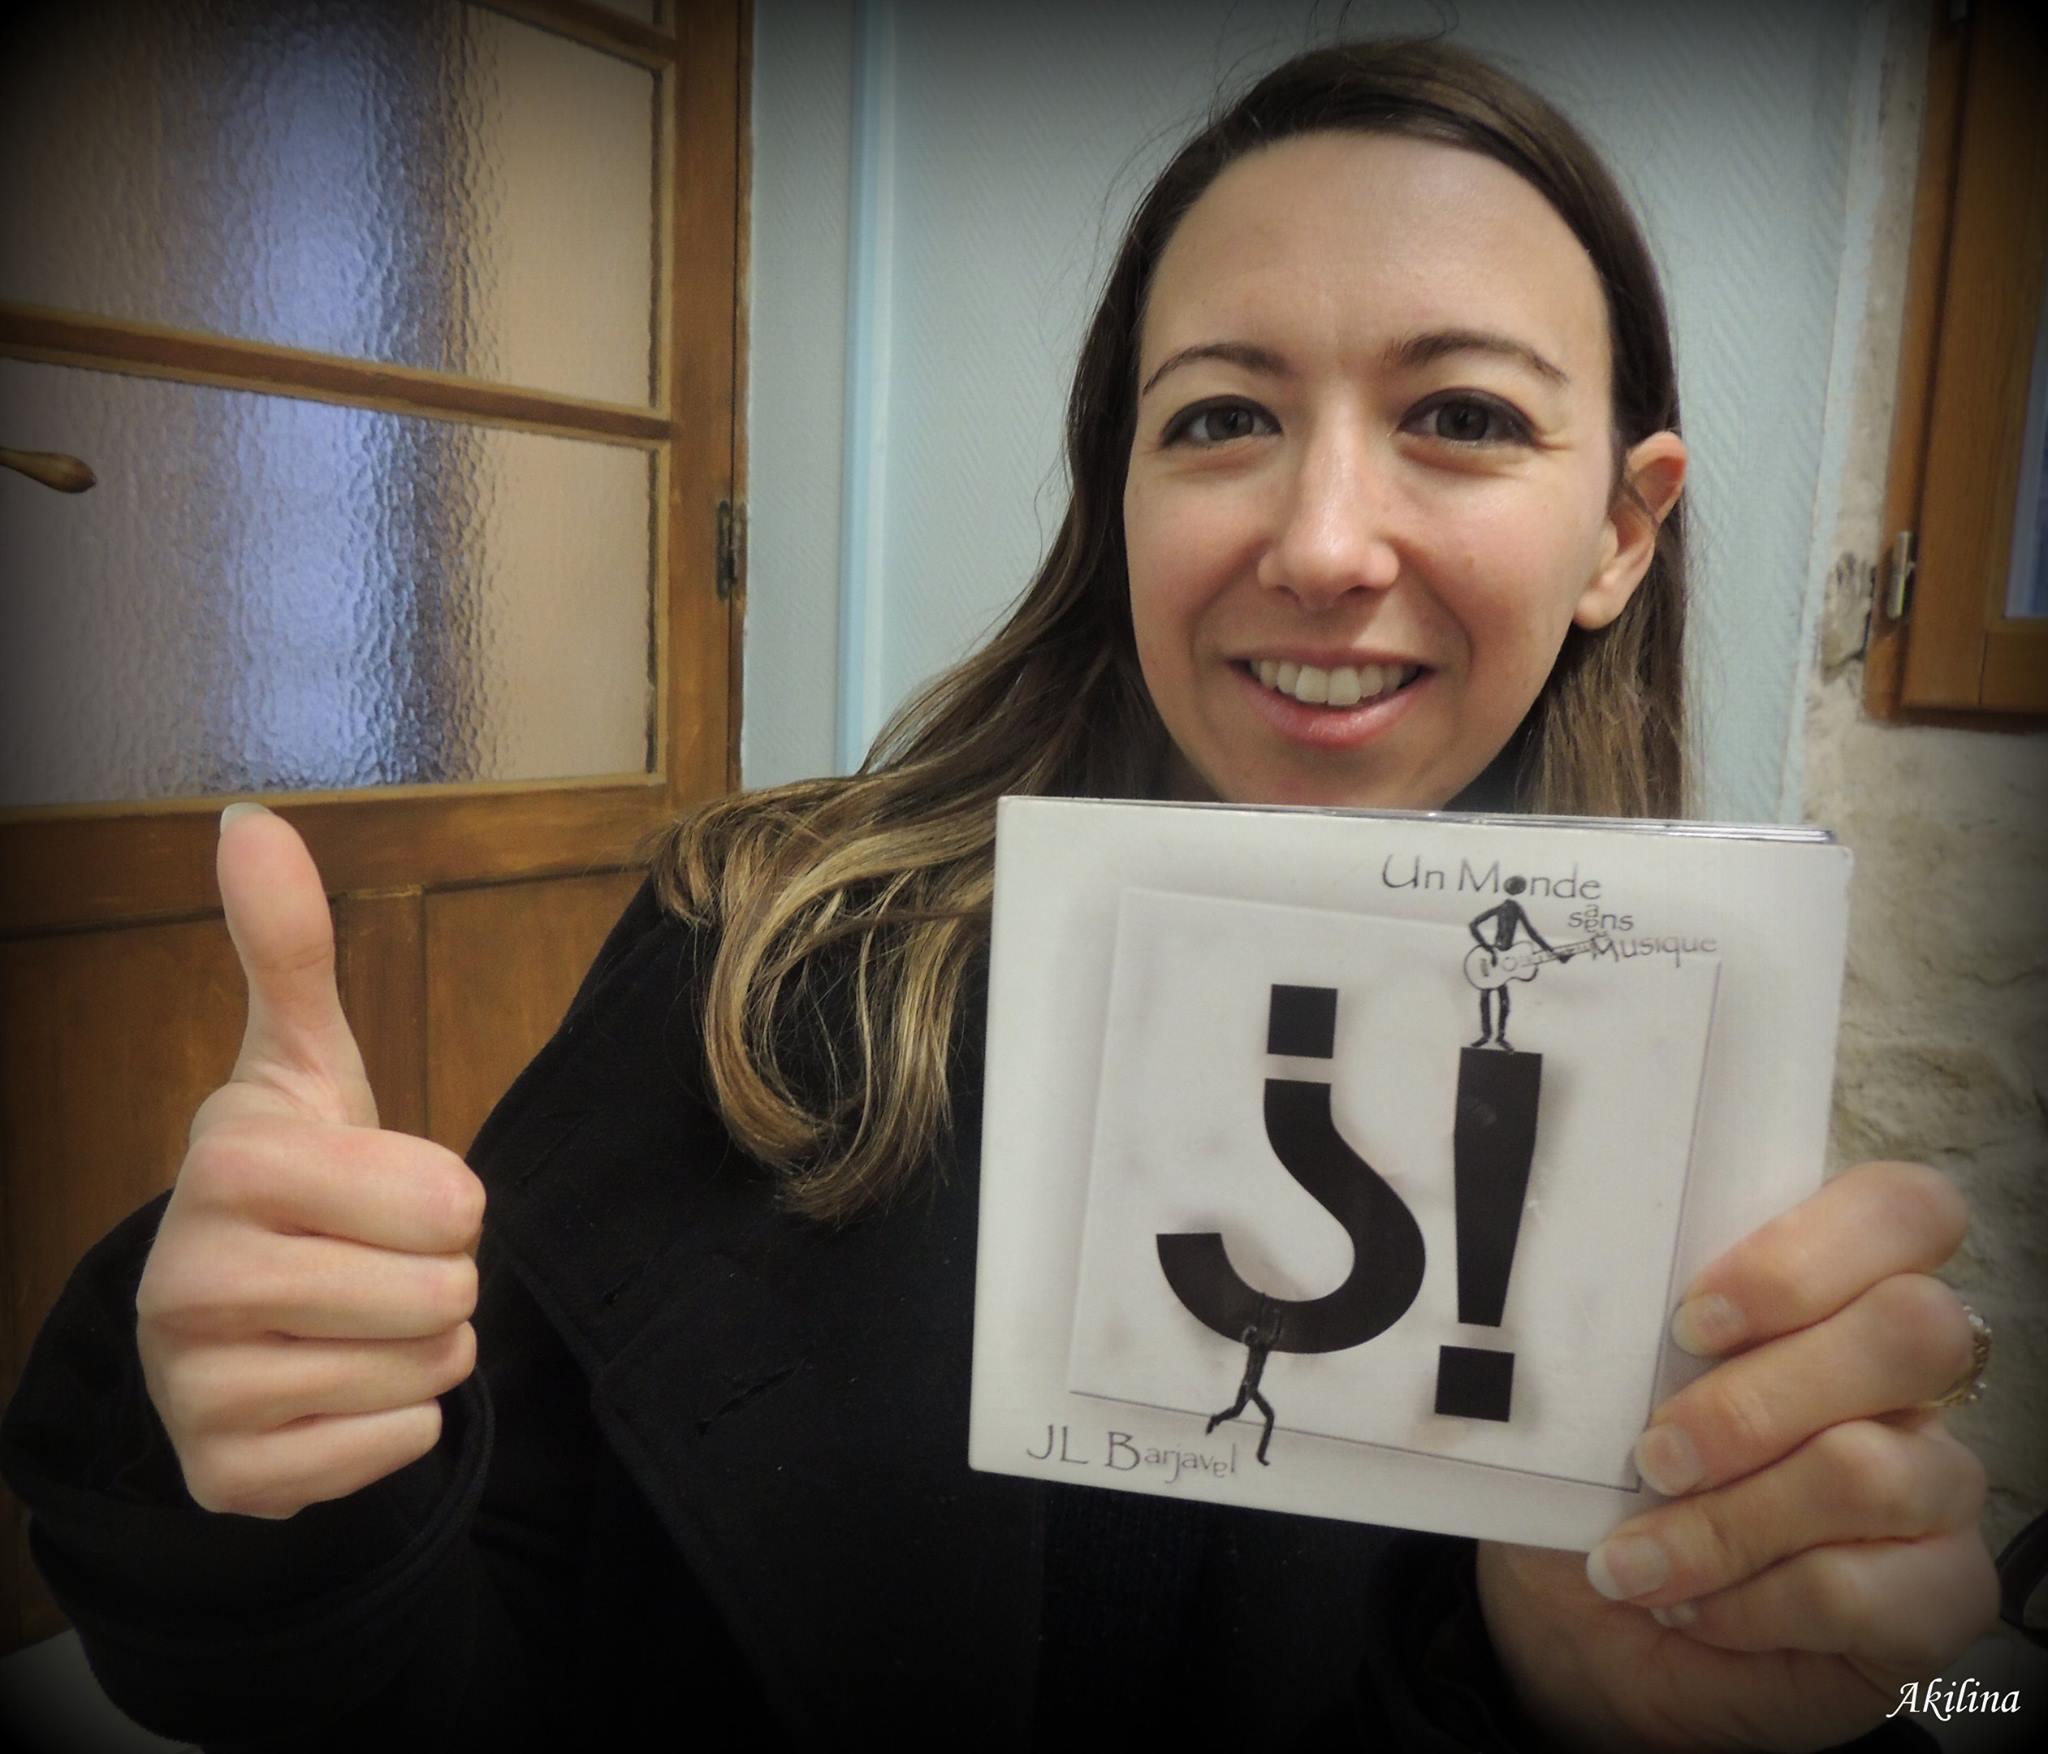 JL Album by Sylvia 146.jpg